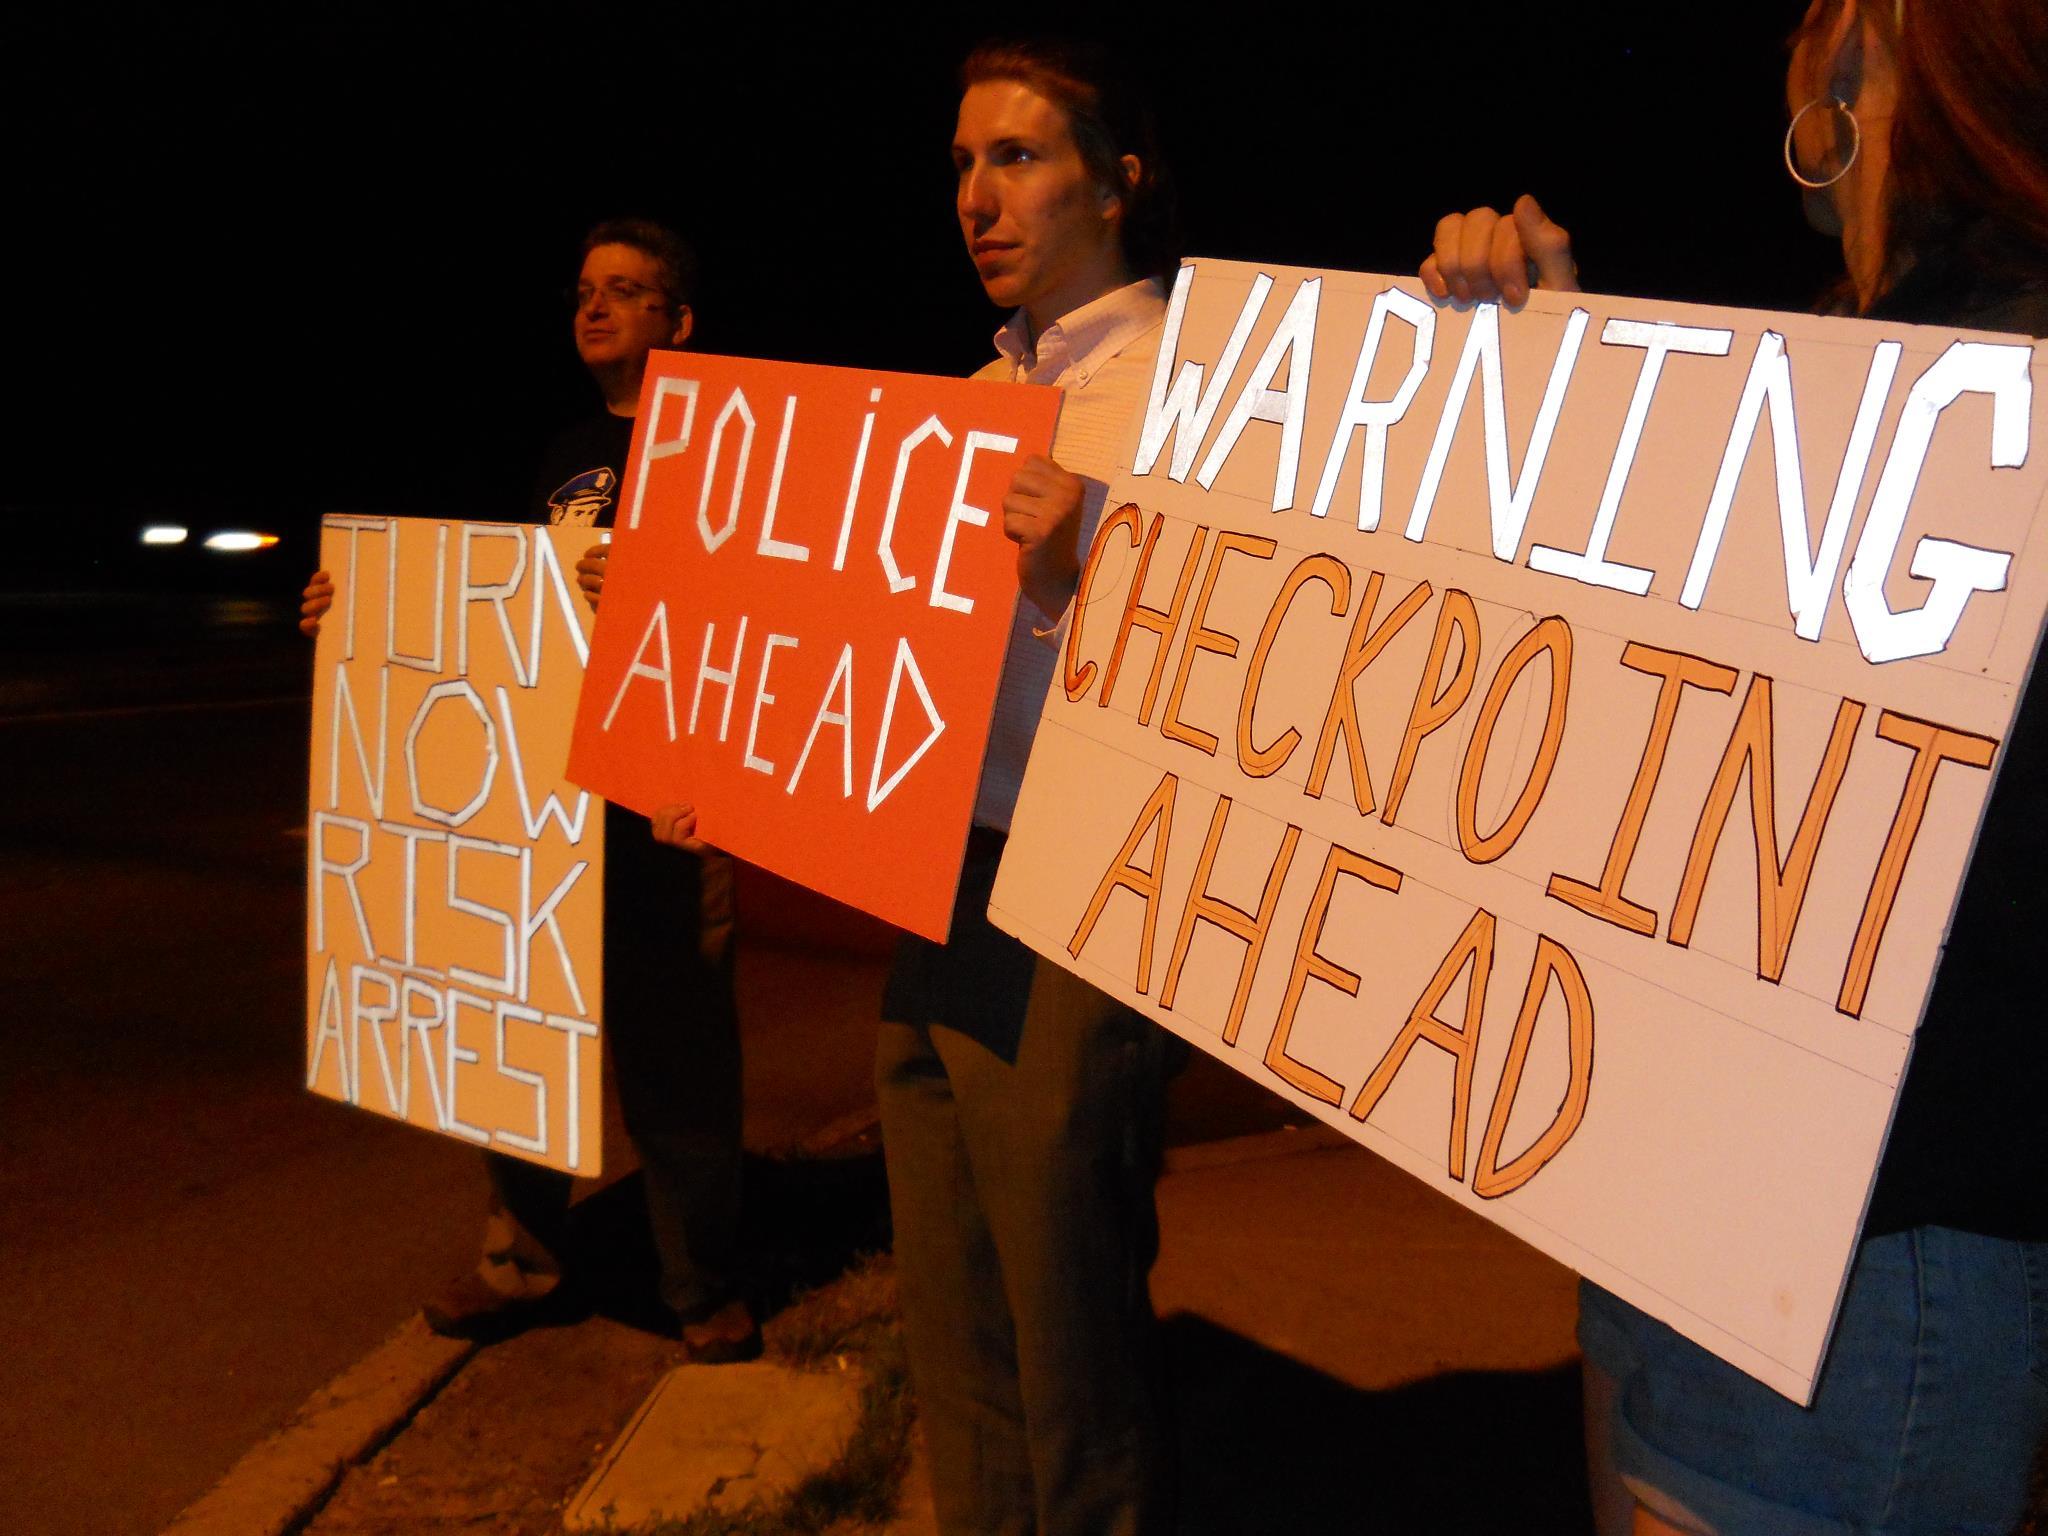 Philadelphia libertarian activists nullify suspicionless checkpoint